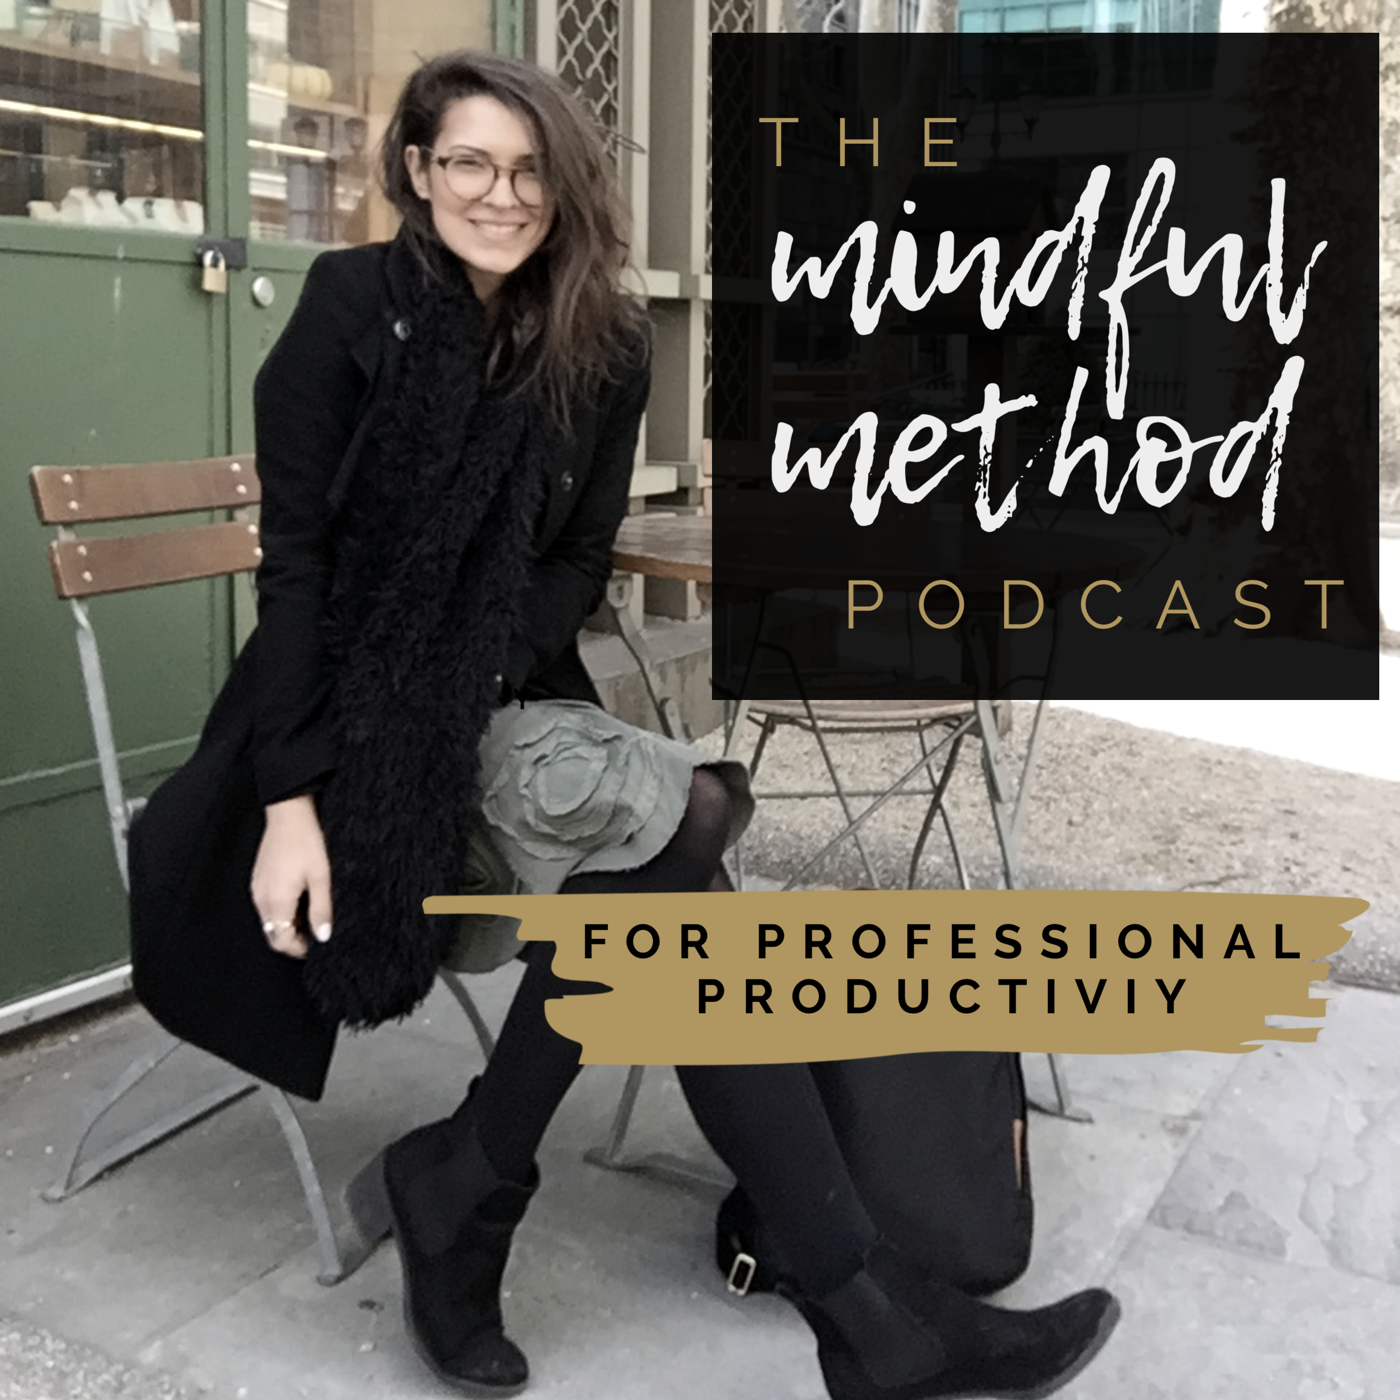 The Mindful Method Podcast by Nina Marinaro Podcast - Listen